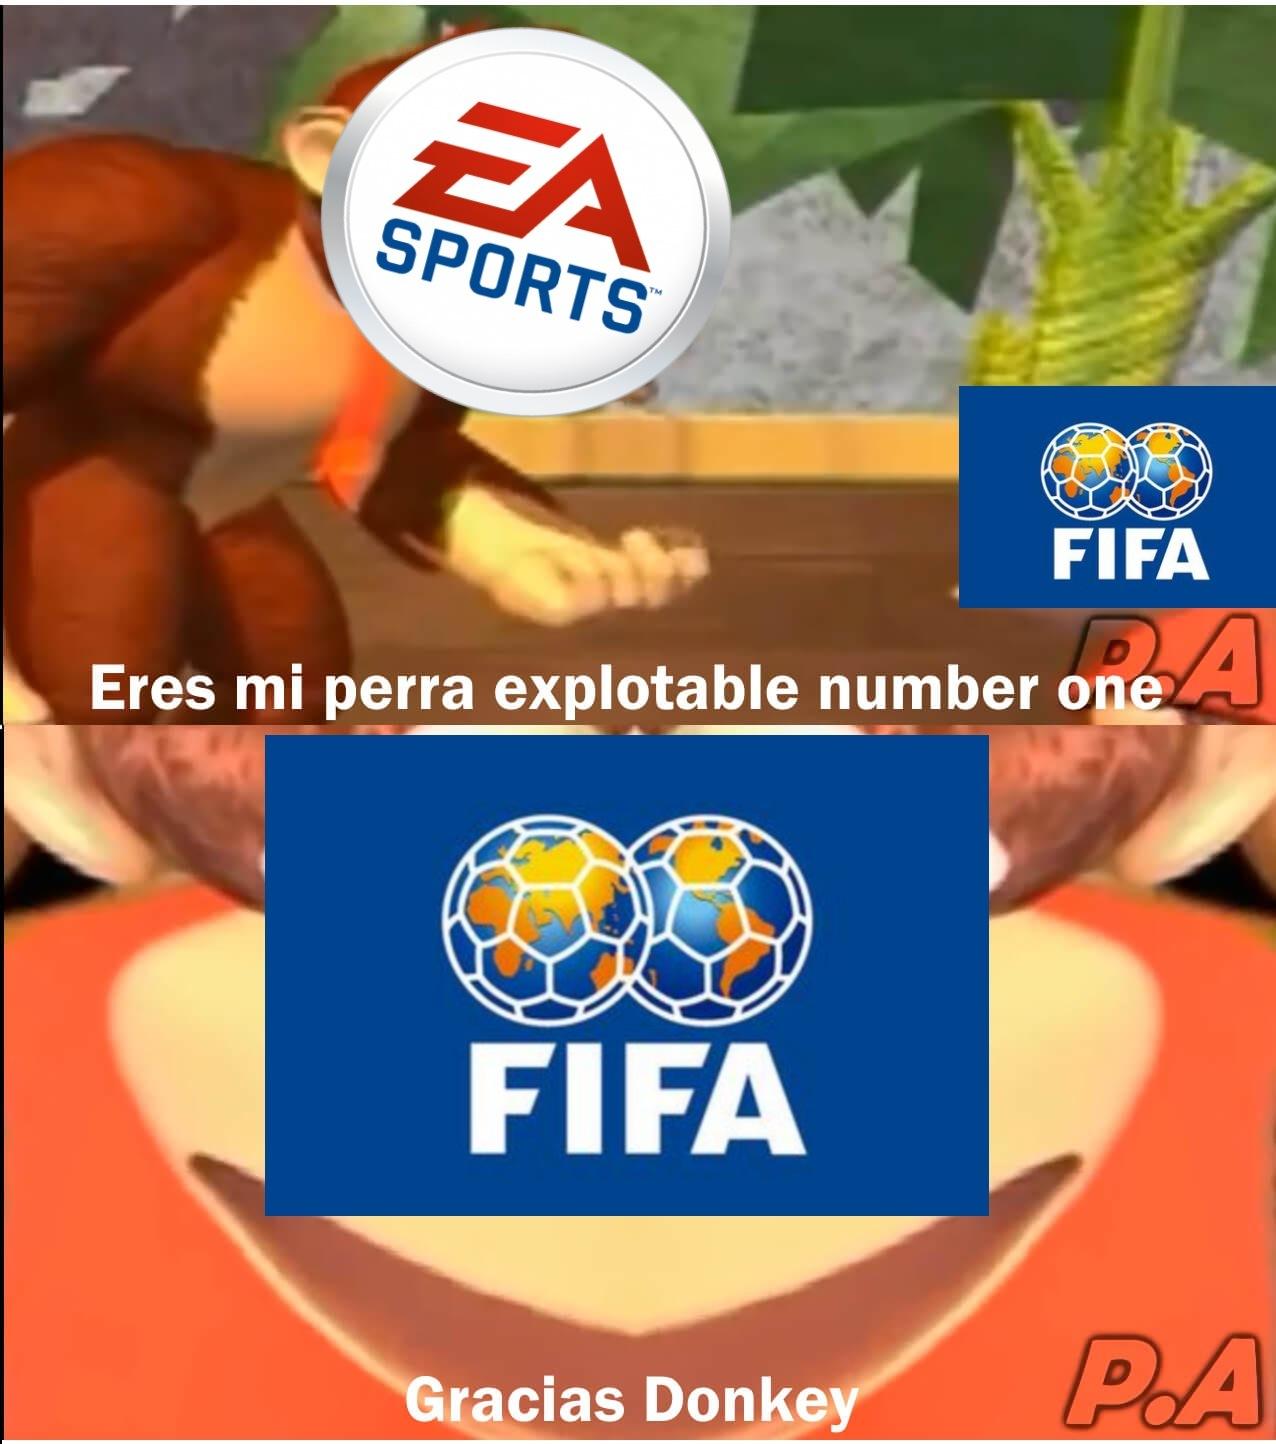 IGN le dió un dos al FIFA 21 señores - meme